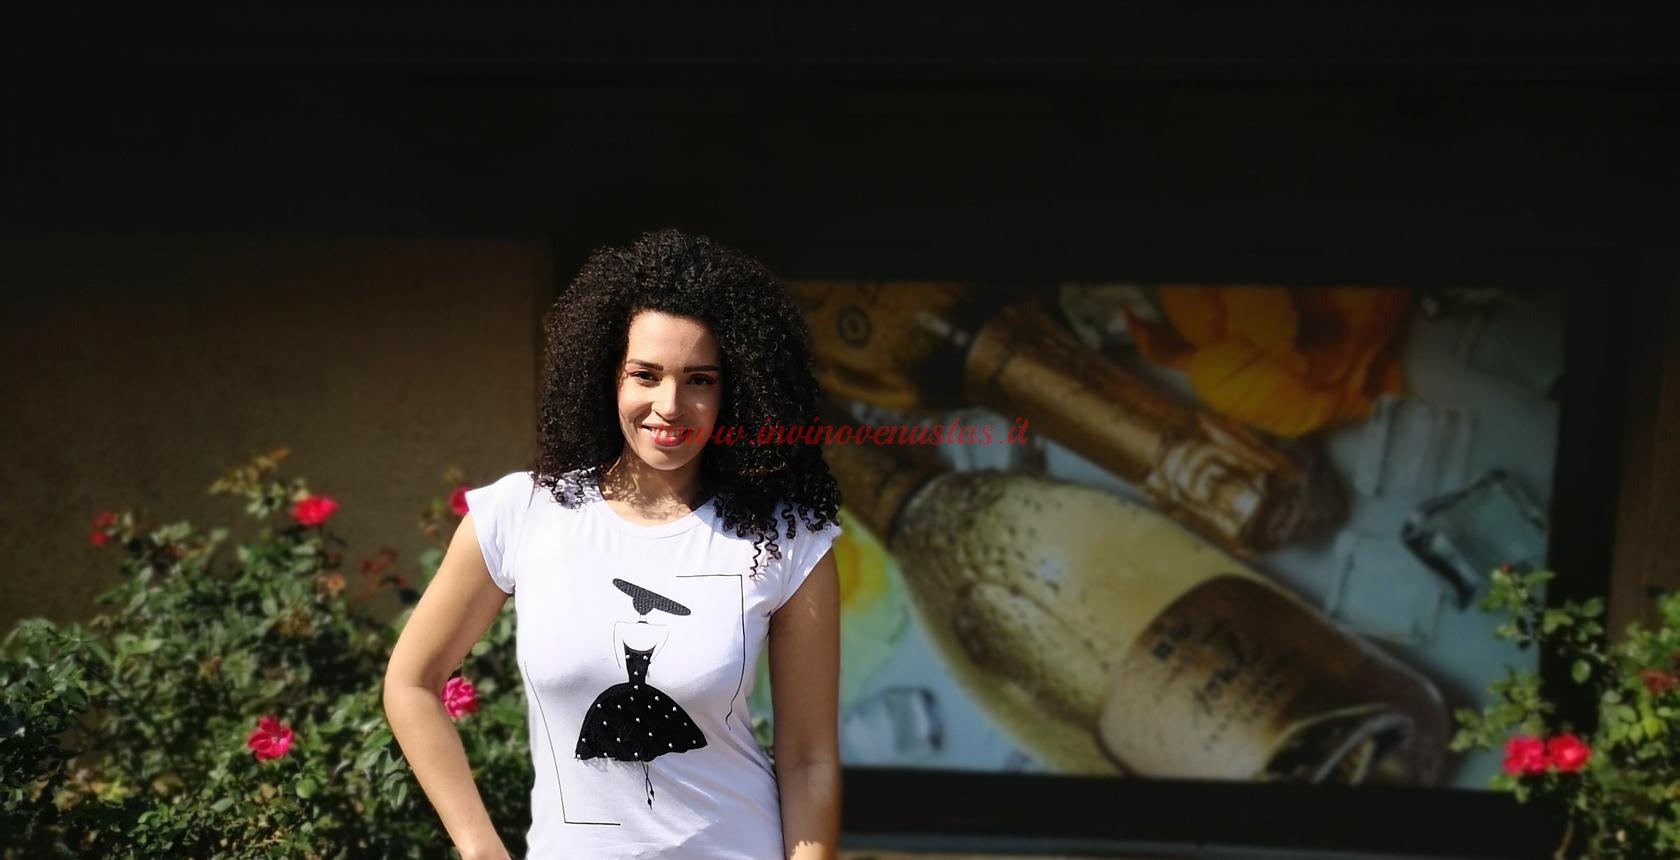 Lara In vino venustas Contadi Castaldi Festival Franciacorta 2019